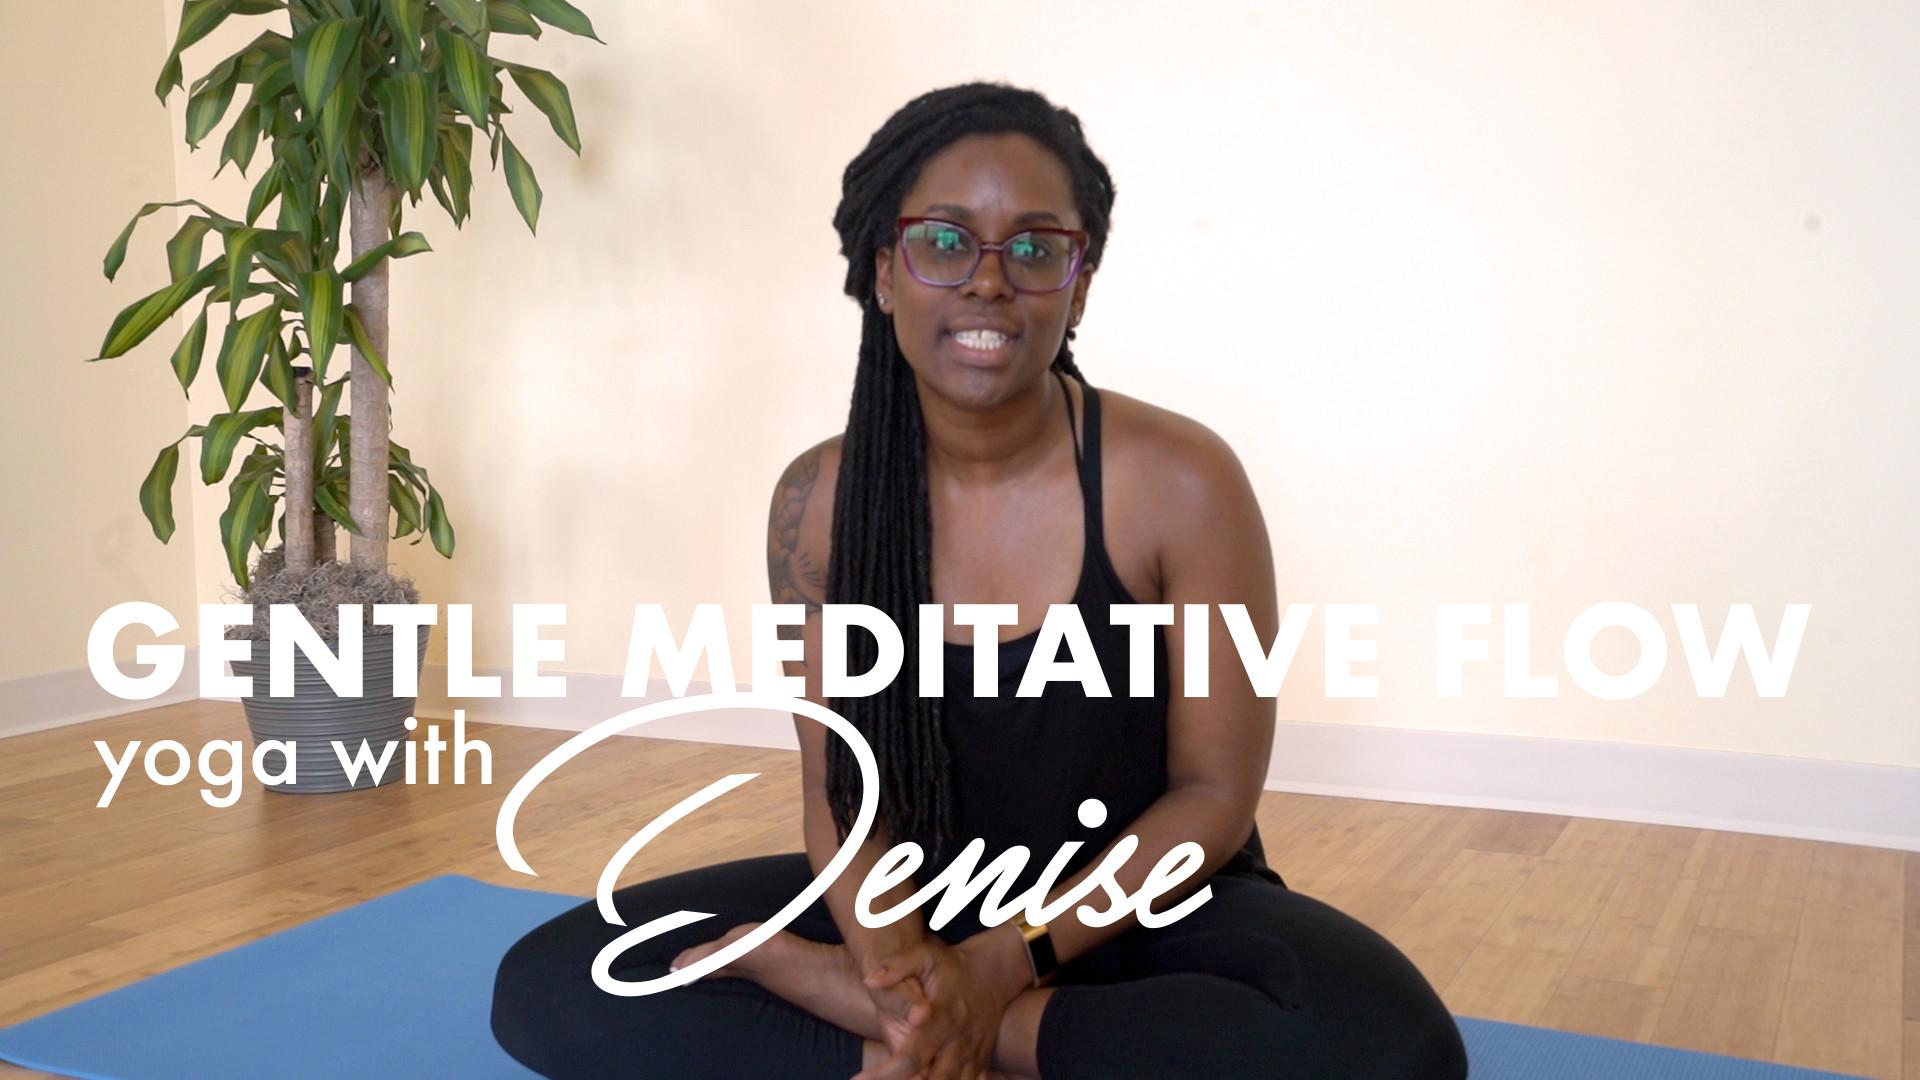 GENTLE MEDITATIVE FLOW: DENISE